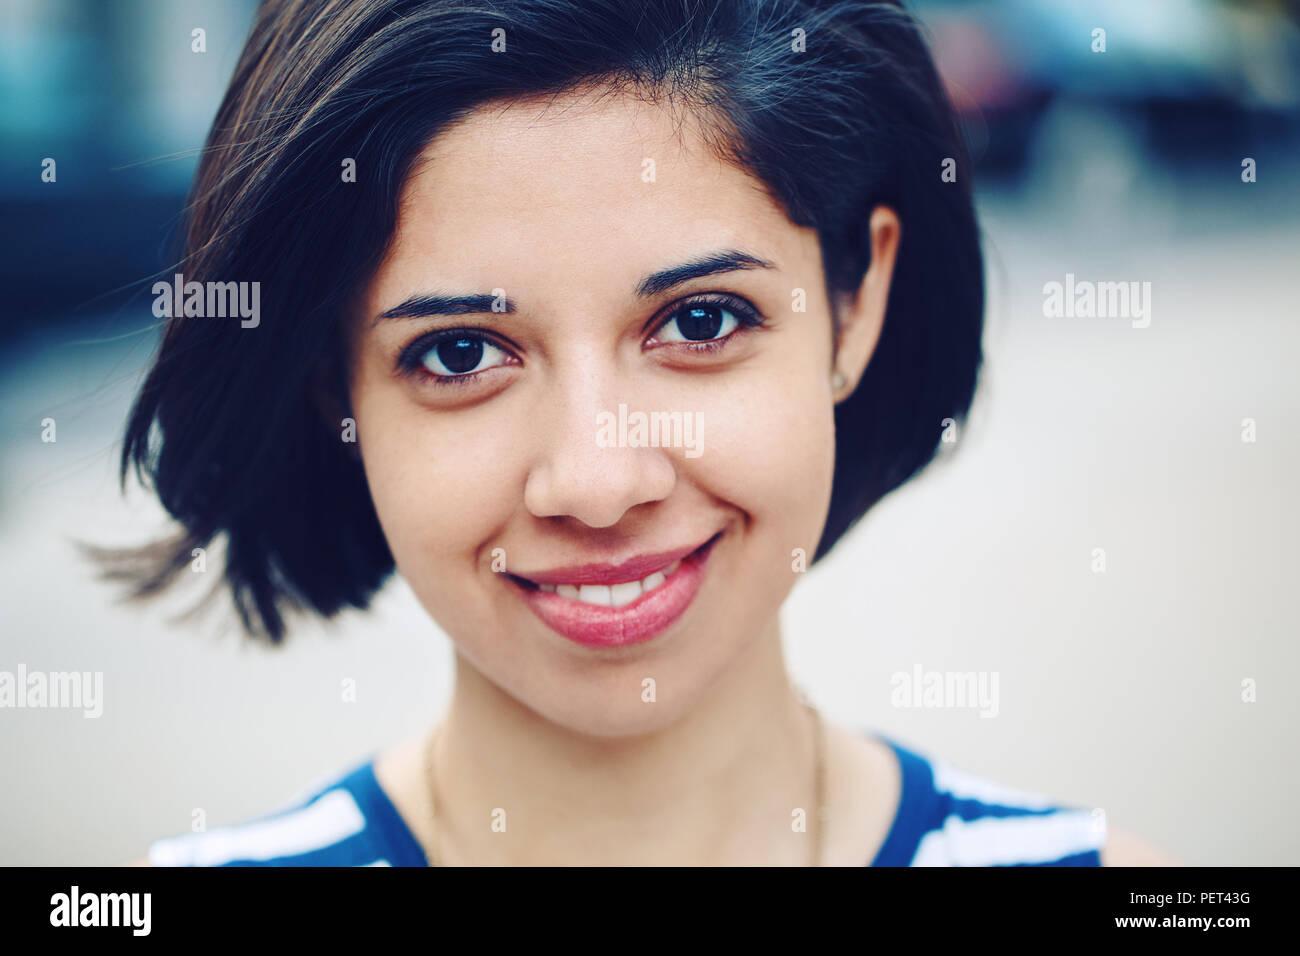 https://c8.alamy.com/comp/PET43G/closeup-portrait-of-beautiful-smiling-young-latin-hispanic-girl-woman-with-short-dark-black-hair-bob-black-eyes-outside-looking-in-camera-toned-wit-PET43G.jpg